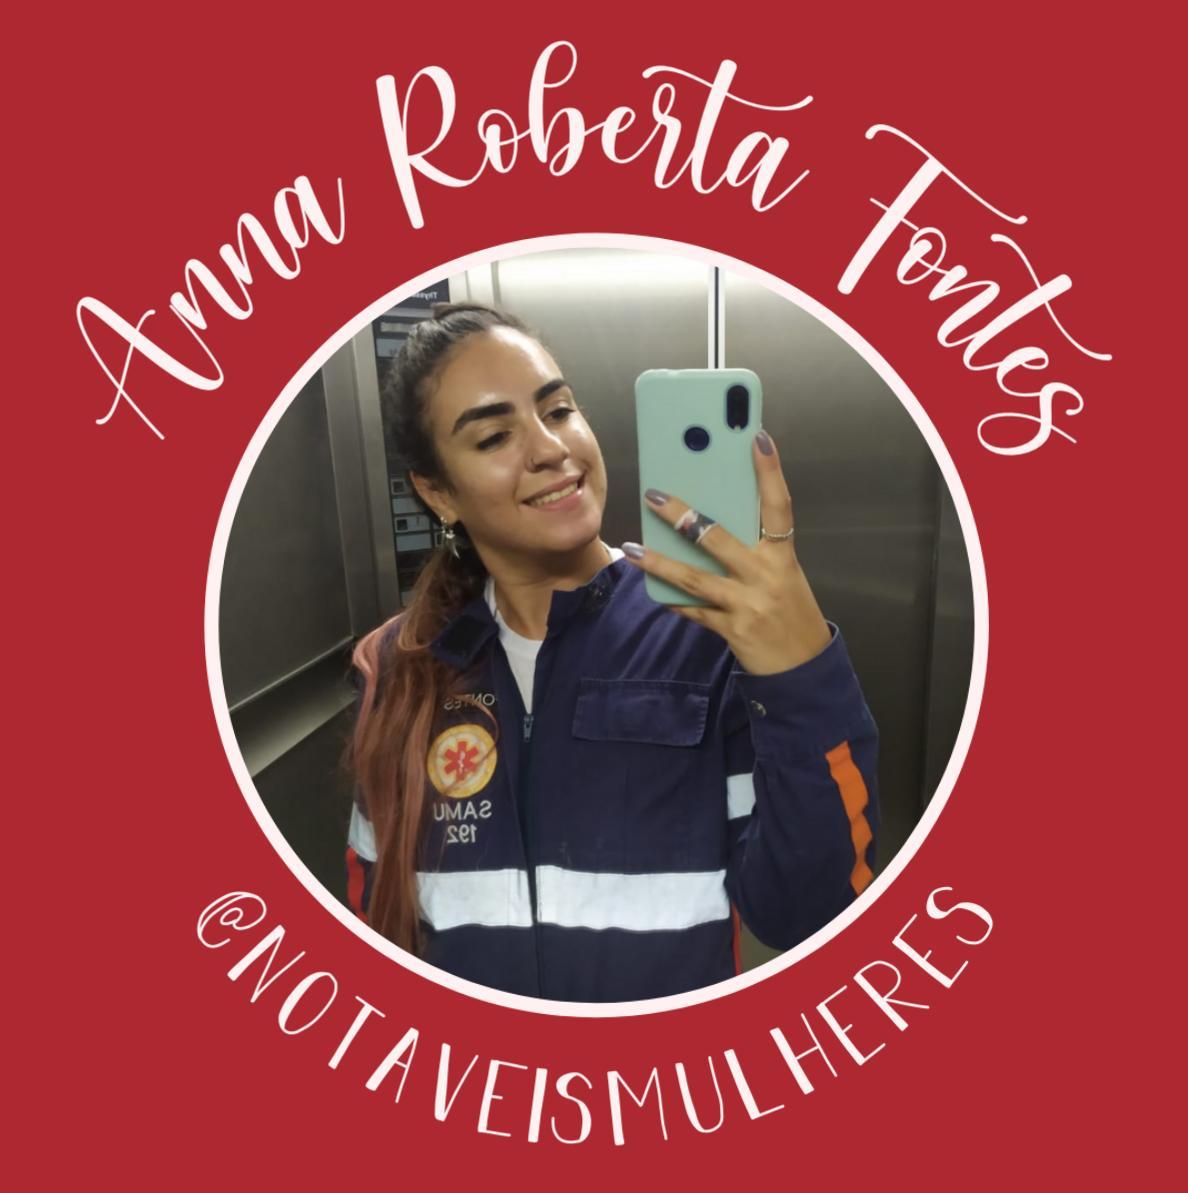 Anna Roberta Fontes Gonçalves